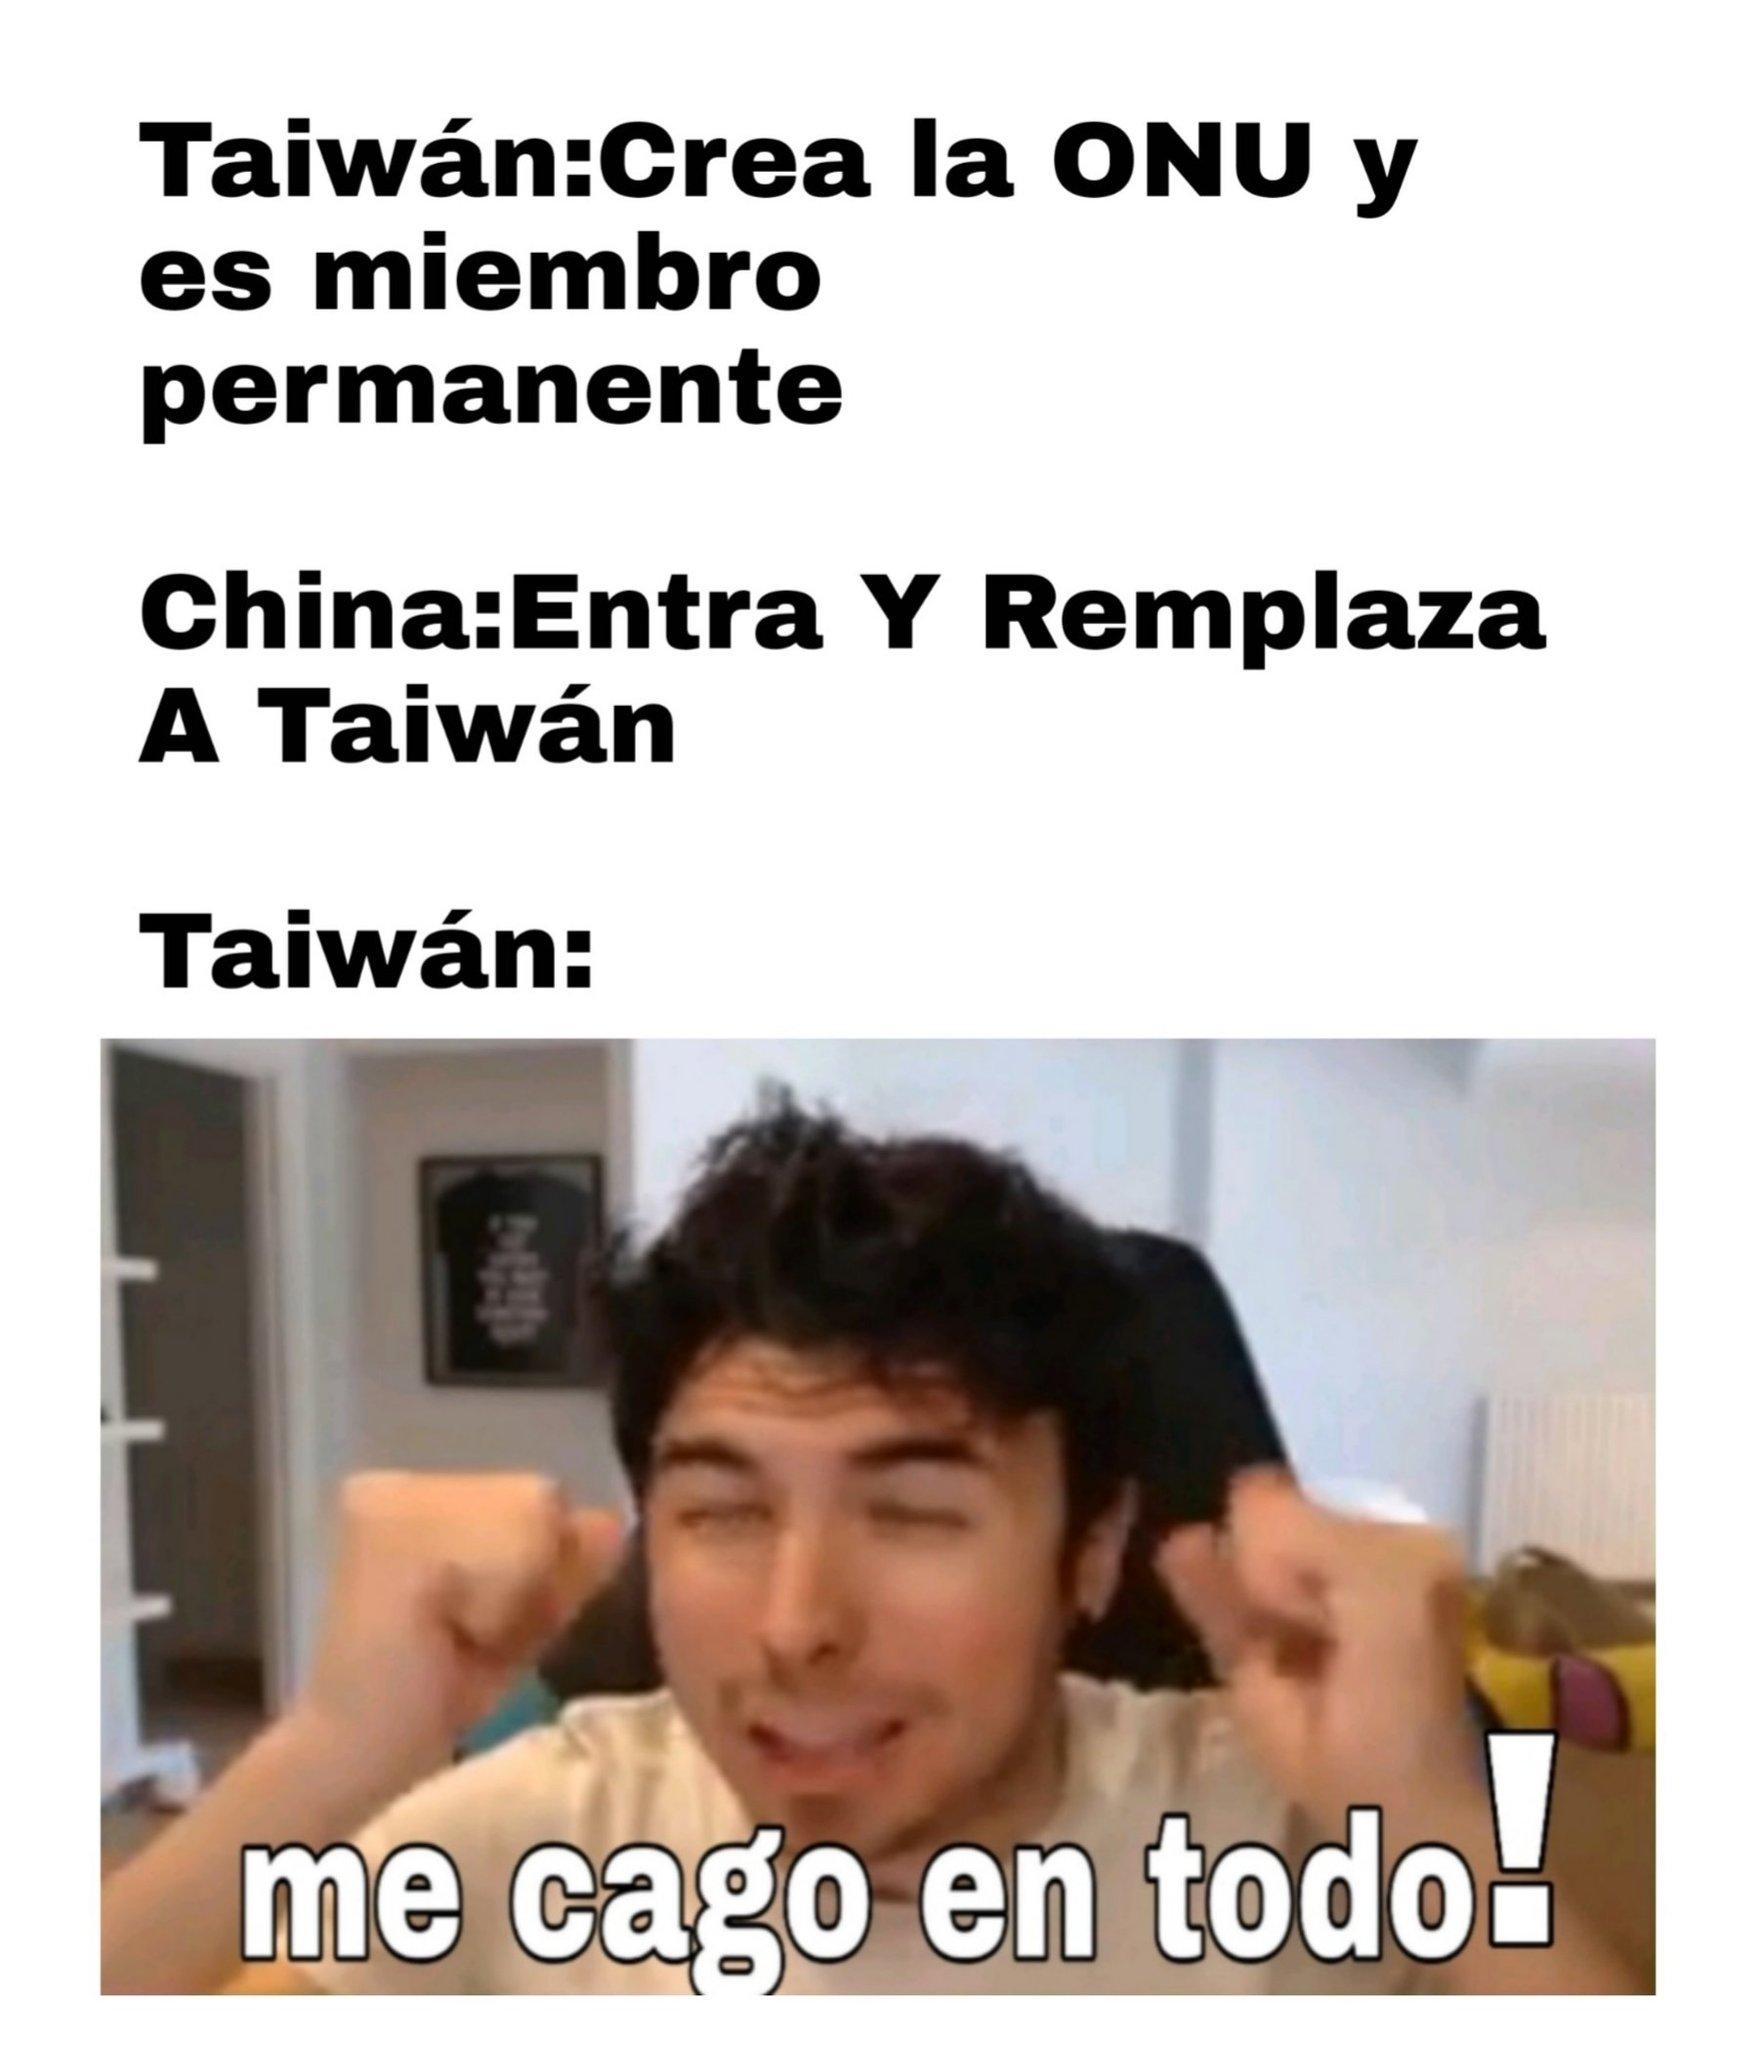 Pobre Taiwán - meme